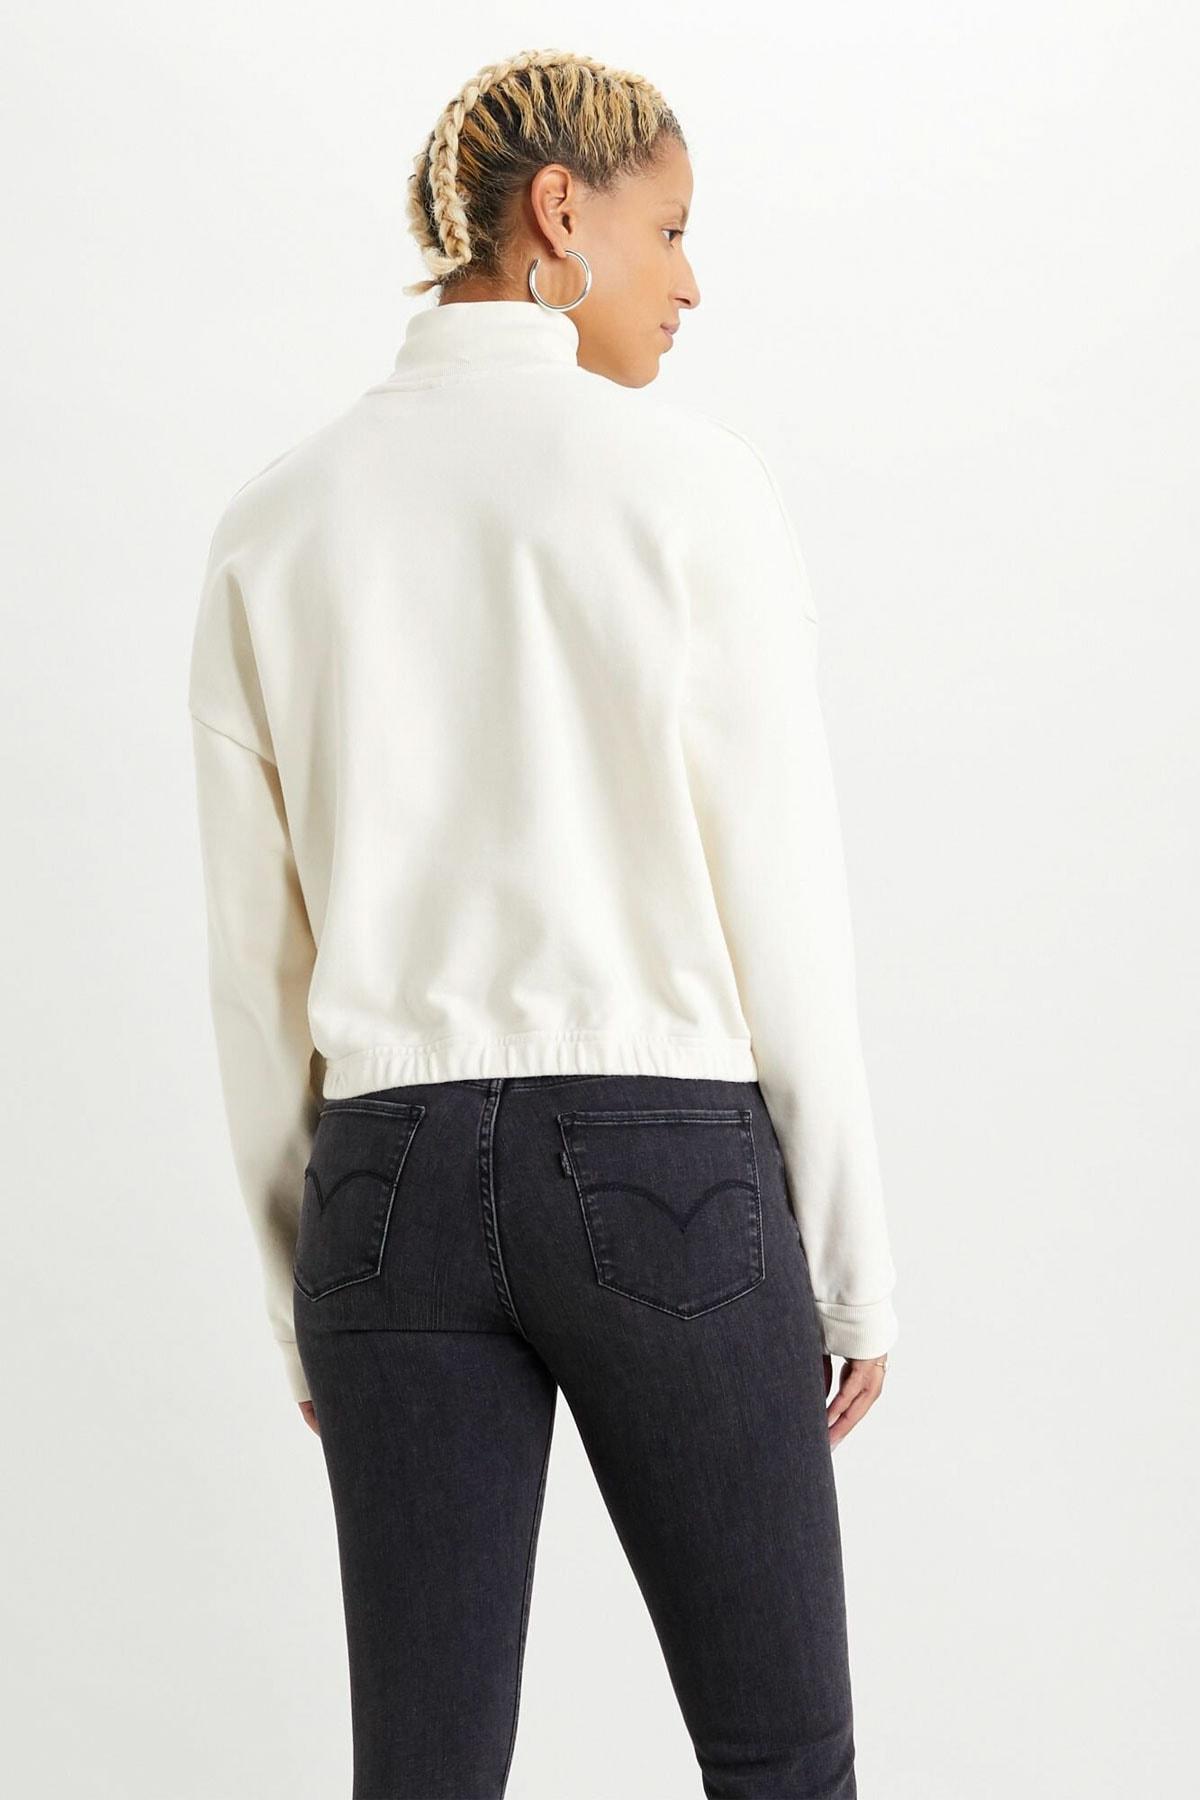 Levi's Kadın Quarter Zip Sweatshirt 21551-0001 2